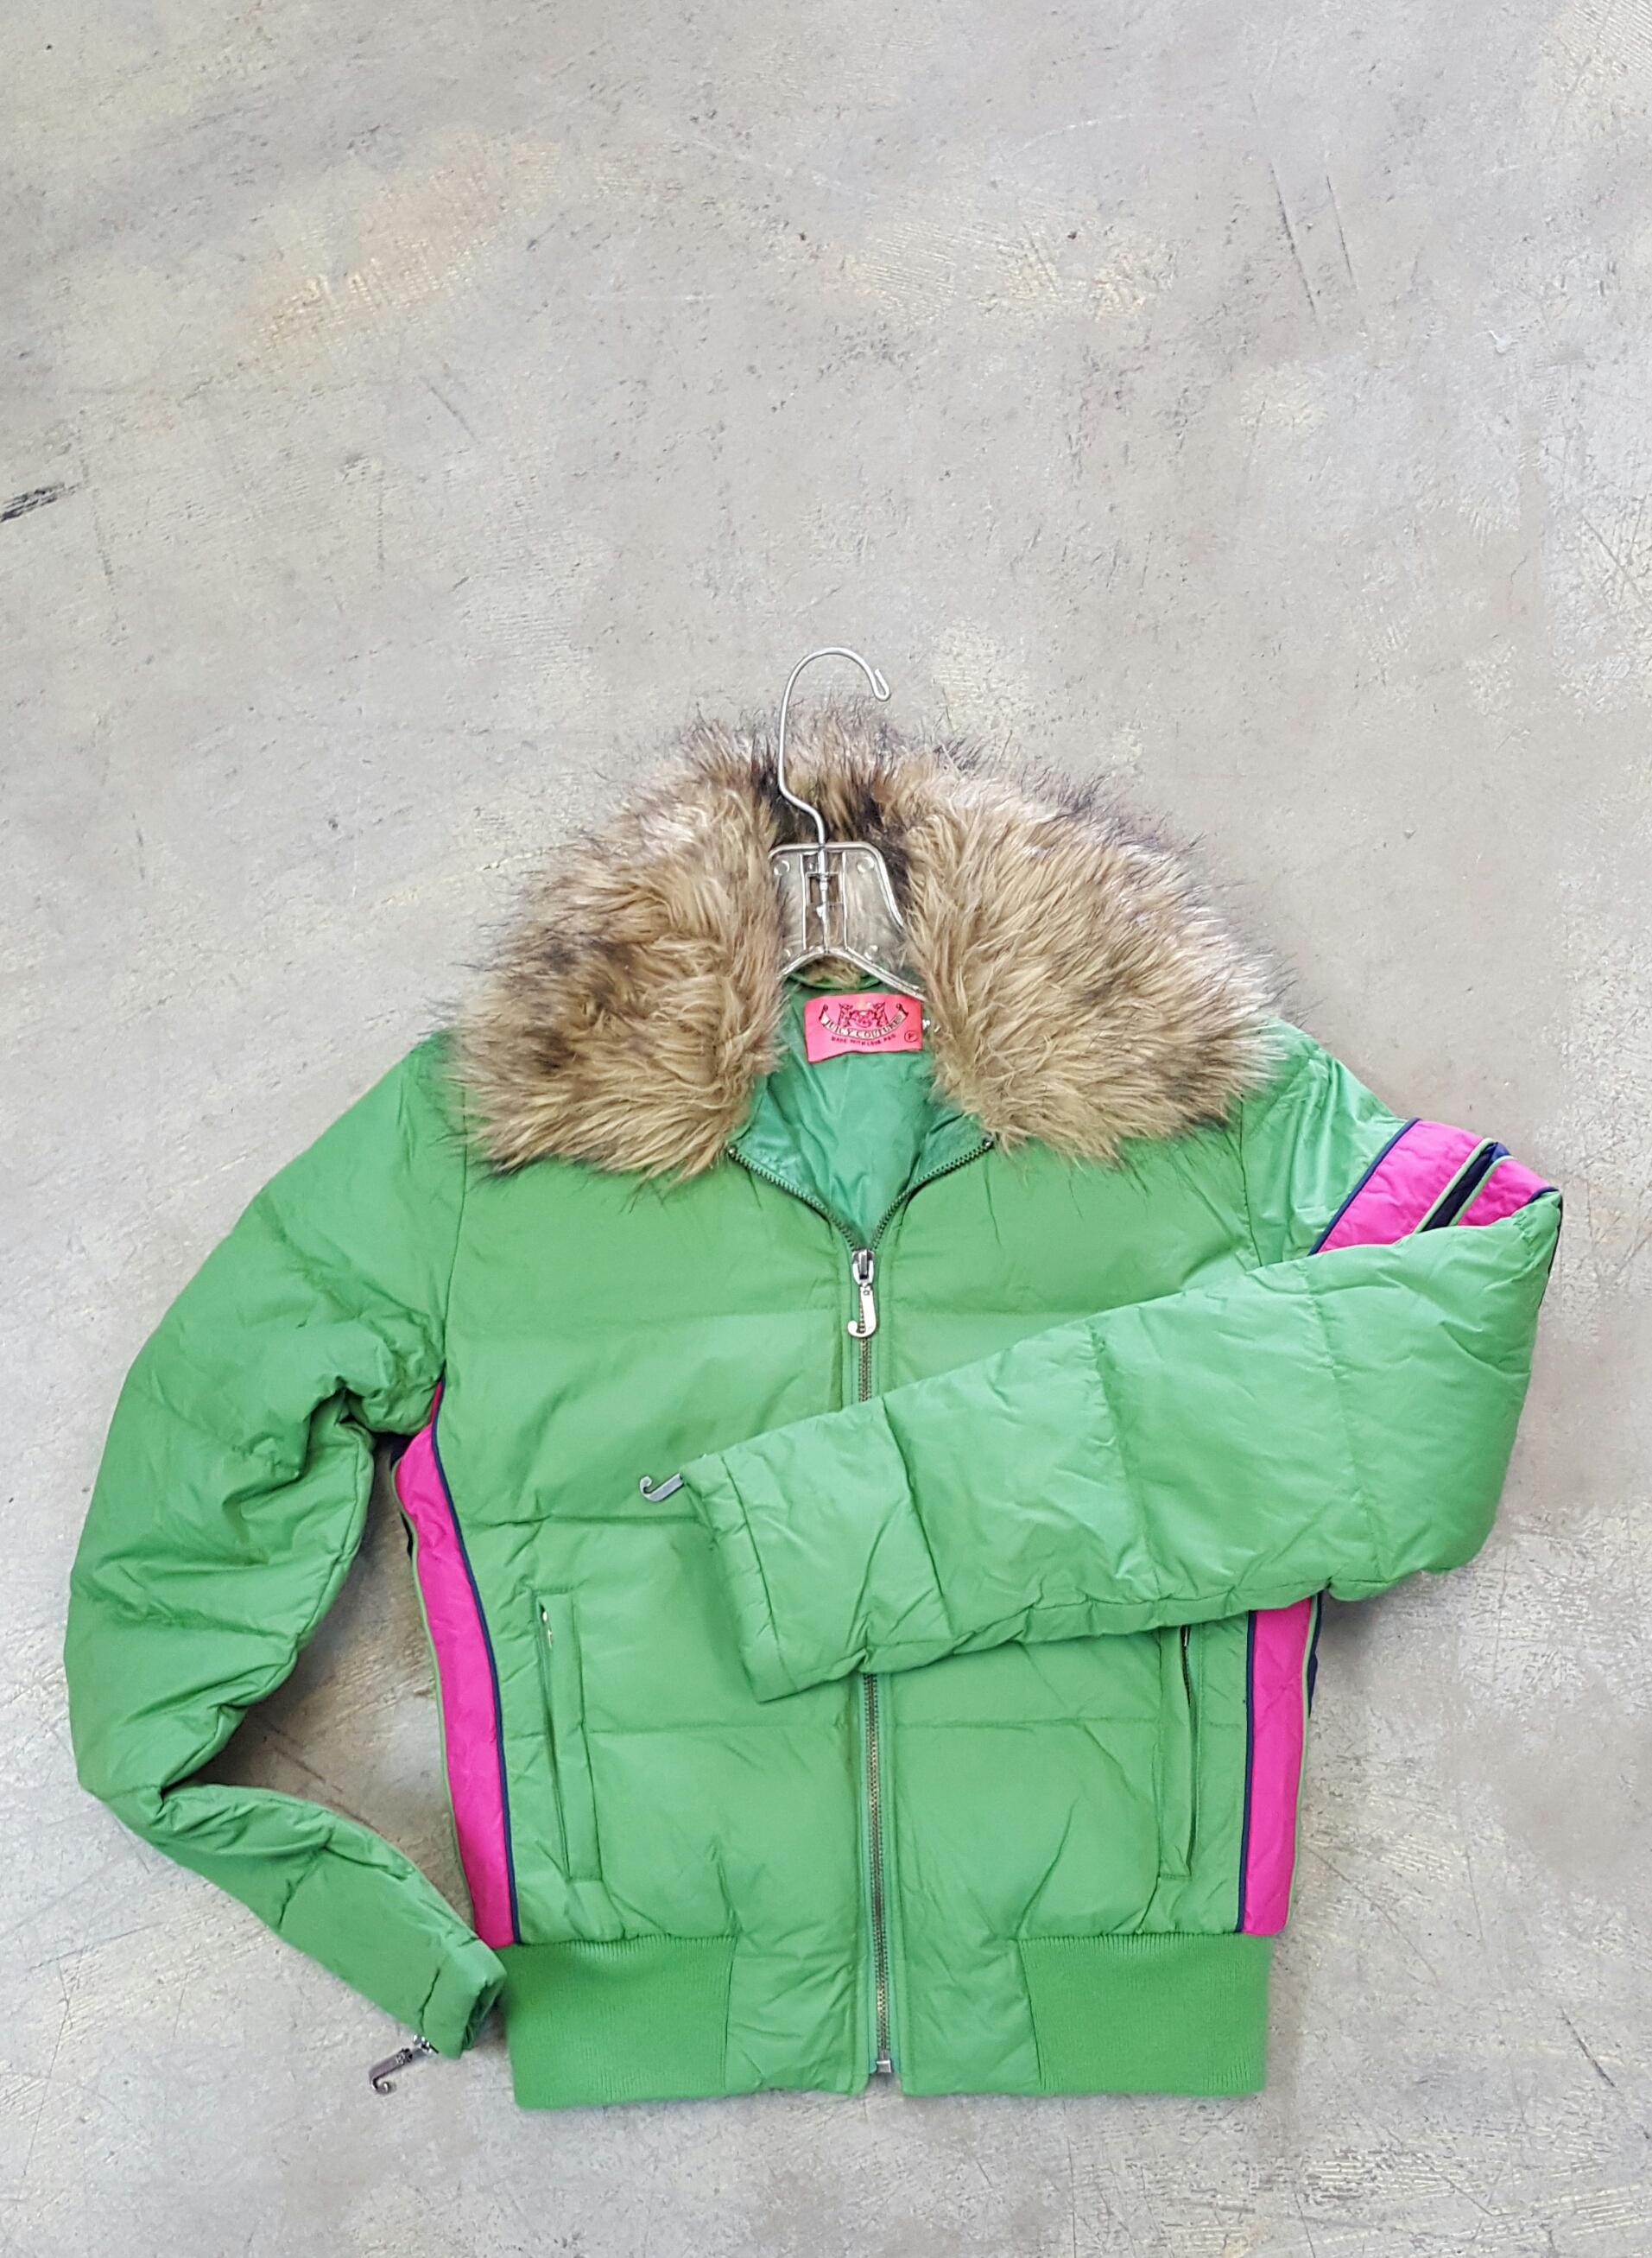 http://azkidznmore.com/wp-content/uploads/2016/01/Jucky_jacket_front.jpg